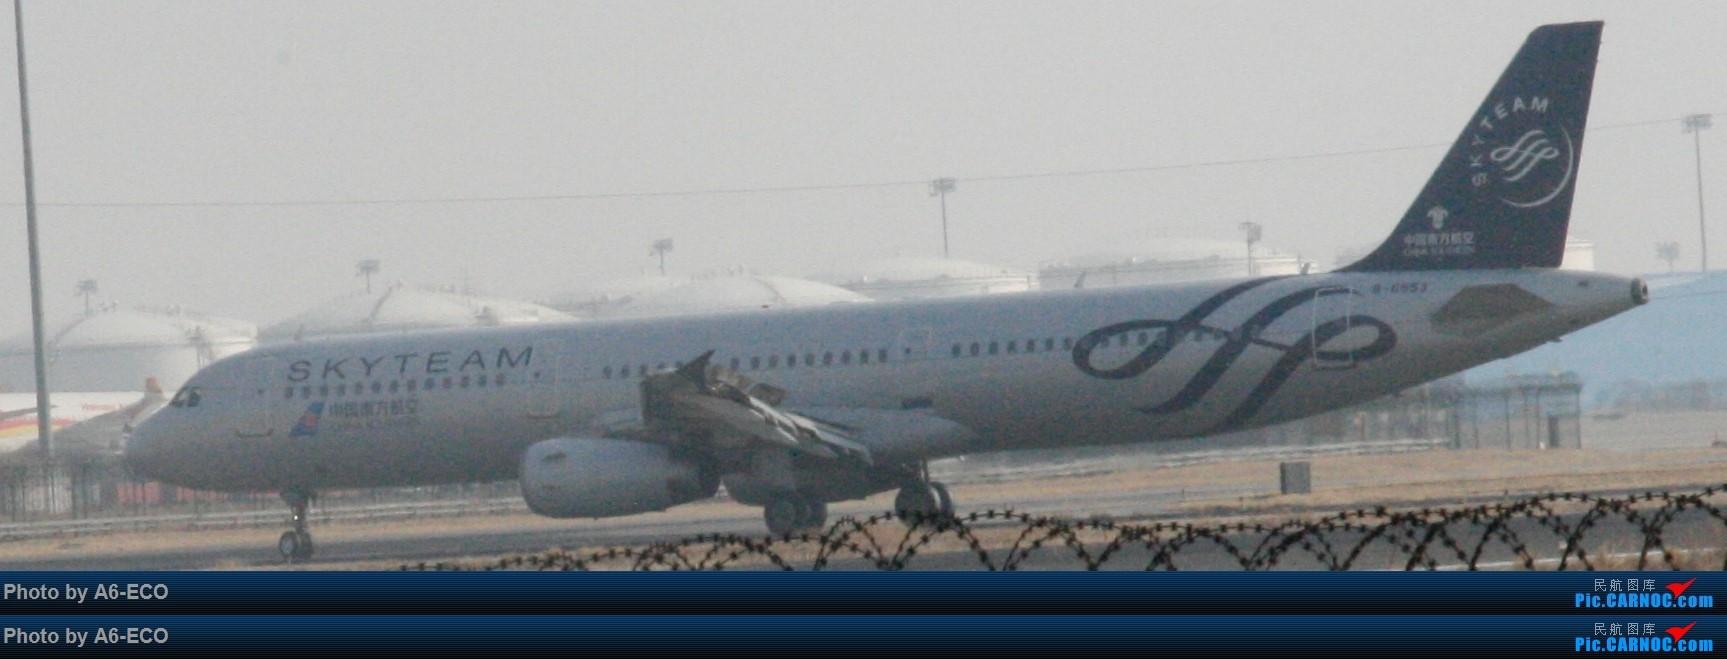 Re:中国南方航空图几张。 AIRBUS A321-200 B-6553 中国北京首都国际机场